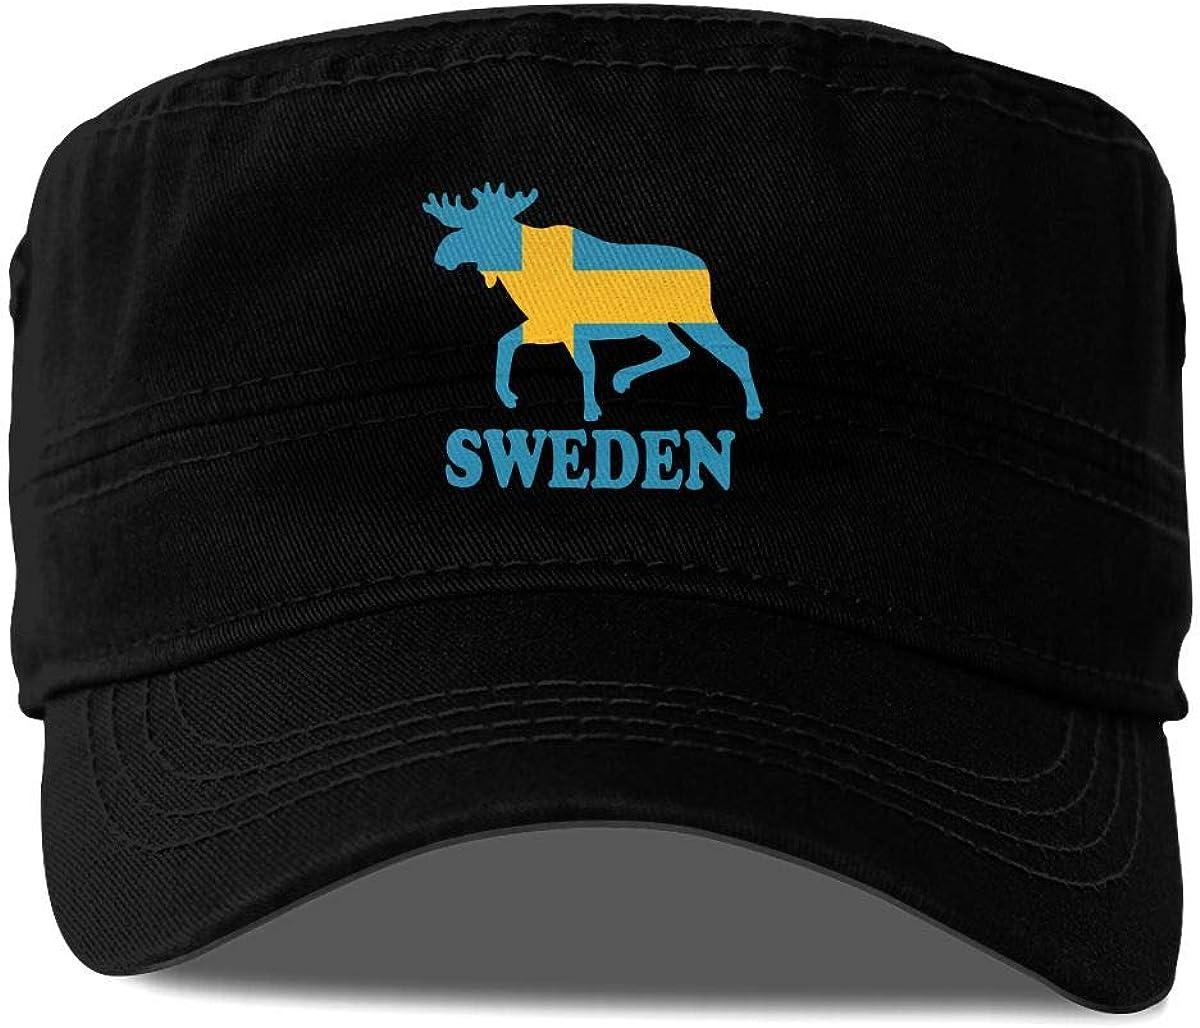 Swedish Flag and Moose Logo Classic Adjustable Cotton Baseball Caps Trucker Driver Hat Outdoor Cap Gray